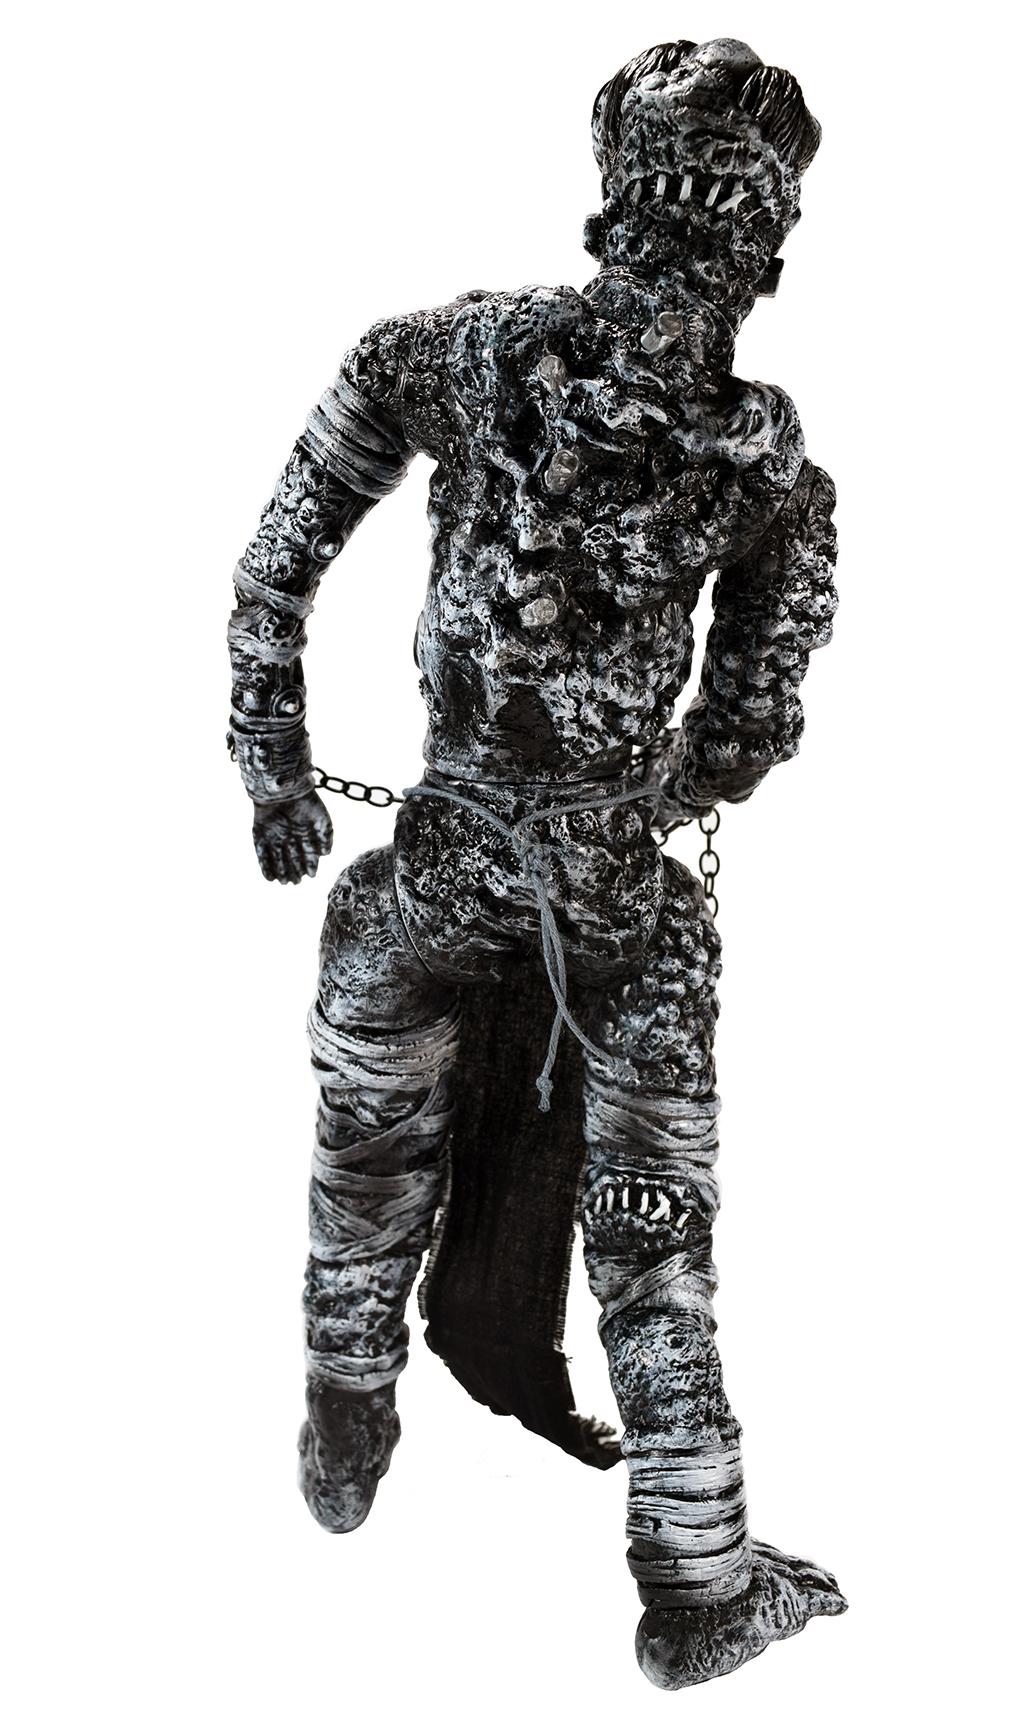 FrankenMerrick Black & White Custom paint Mark Nagata x Miscreations